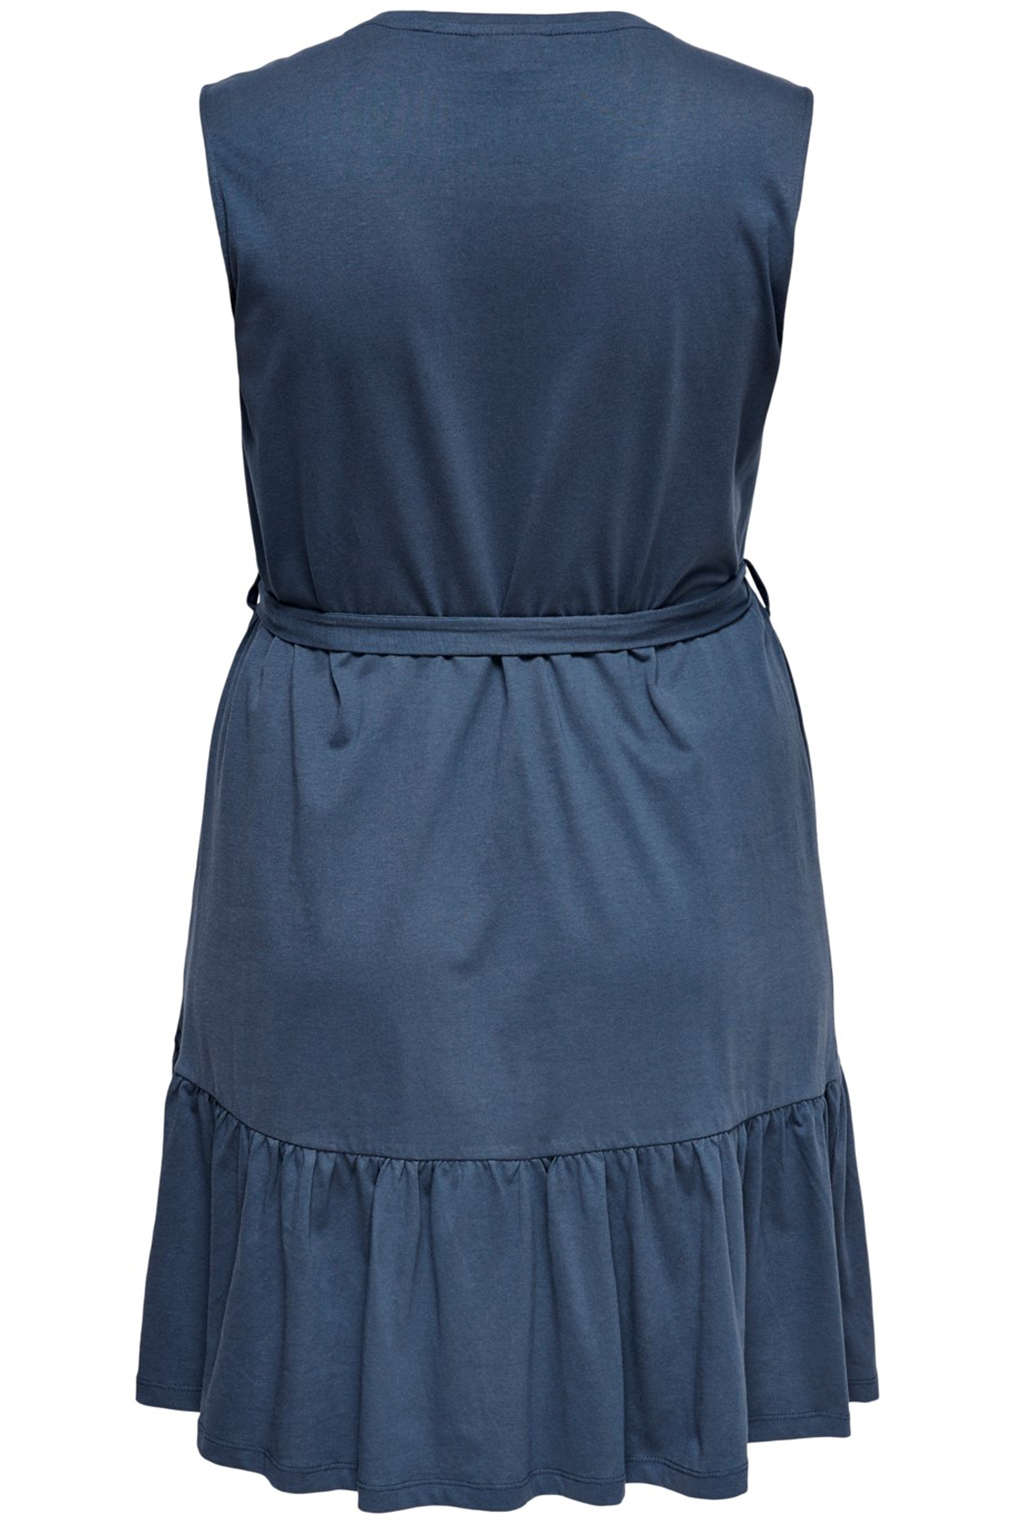 ONLY Carmakoma jurk CARNIGHT LIFE